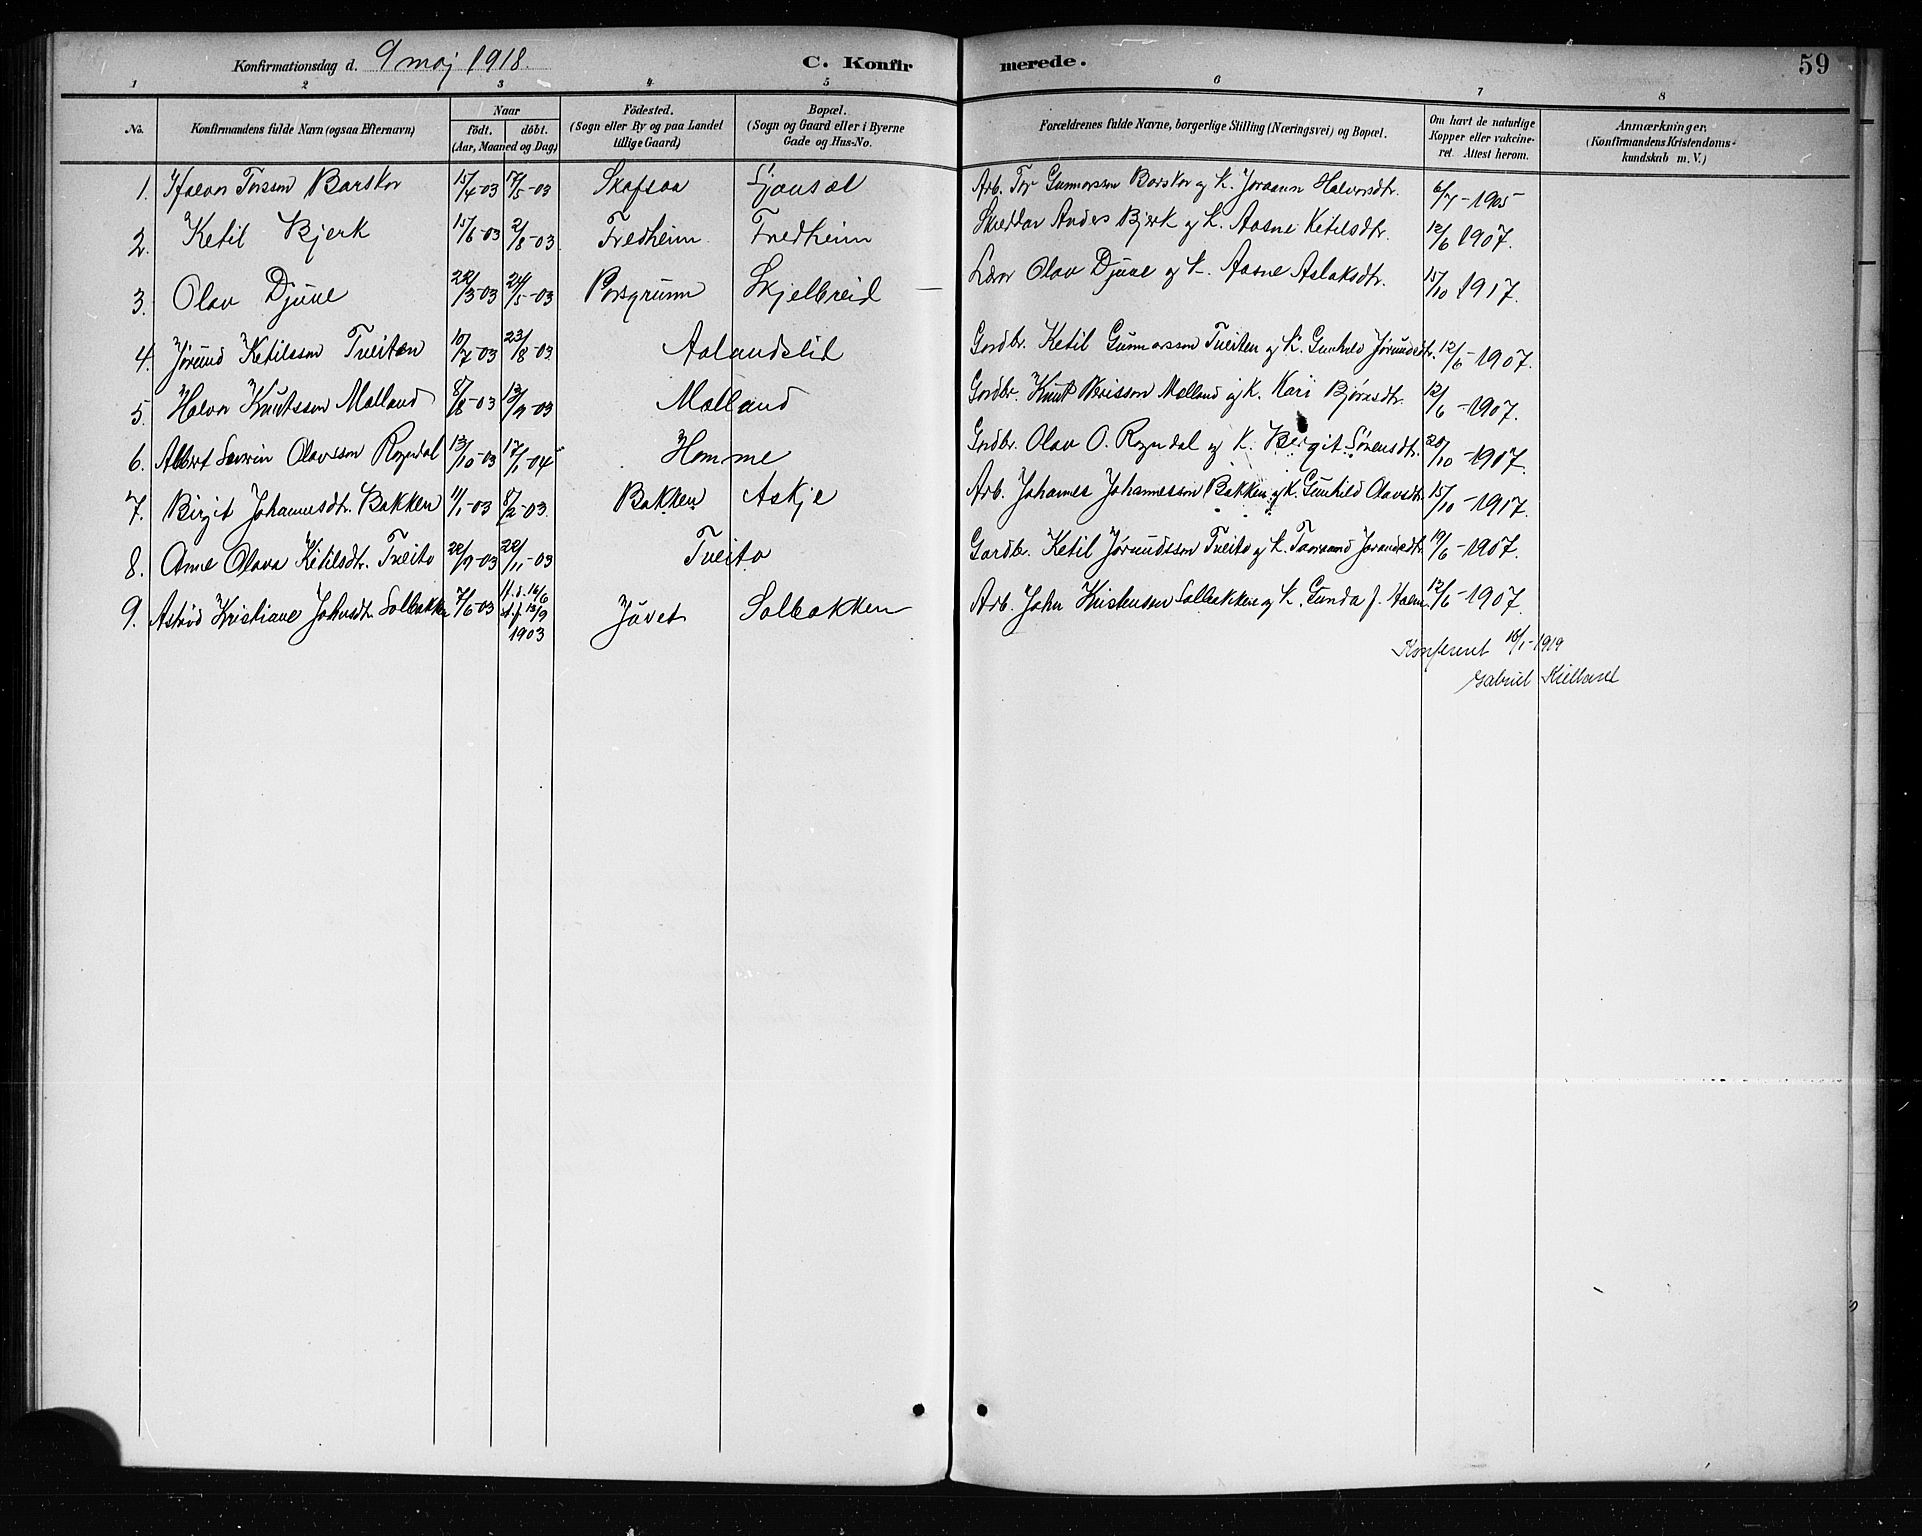 SAKO, Lårdal kirkebøker, G/Ga/L0003: Klokkerbok nr. I 3, 1891-1918, s. 59